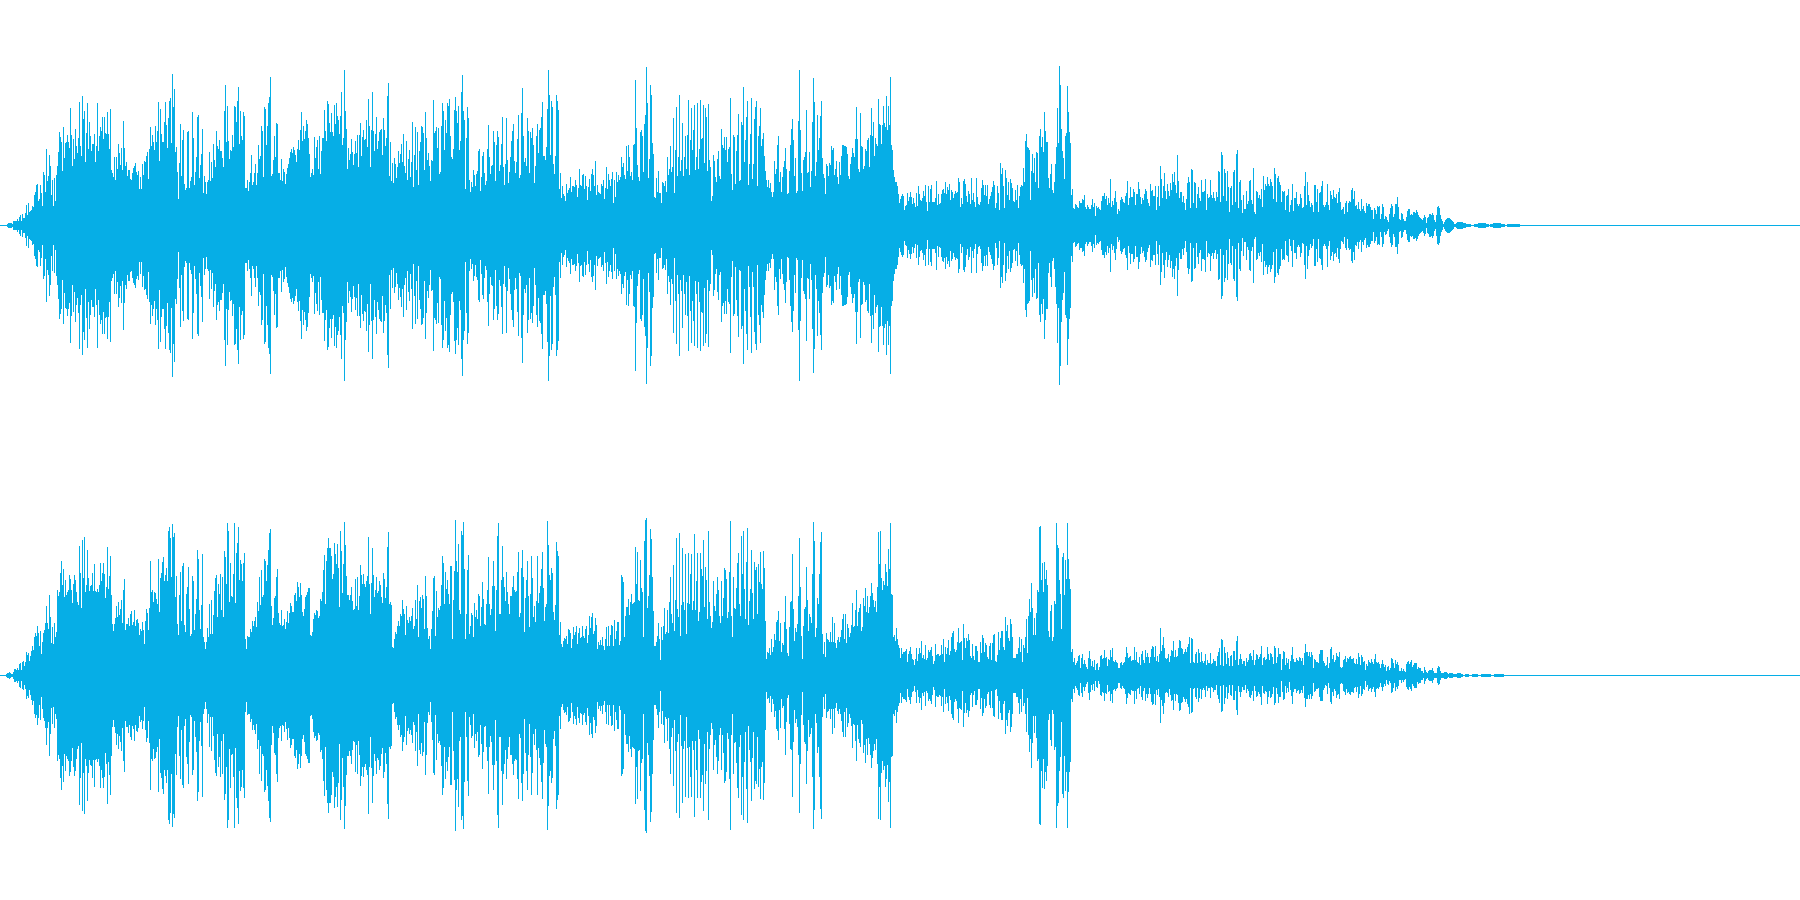 DJスクラッチ01_リバース音01の再生済みの波形